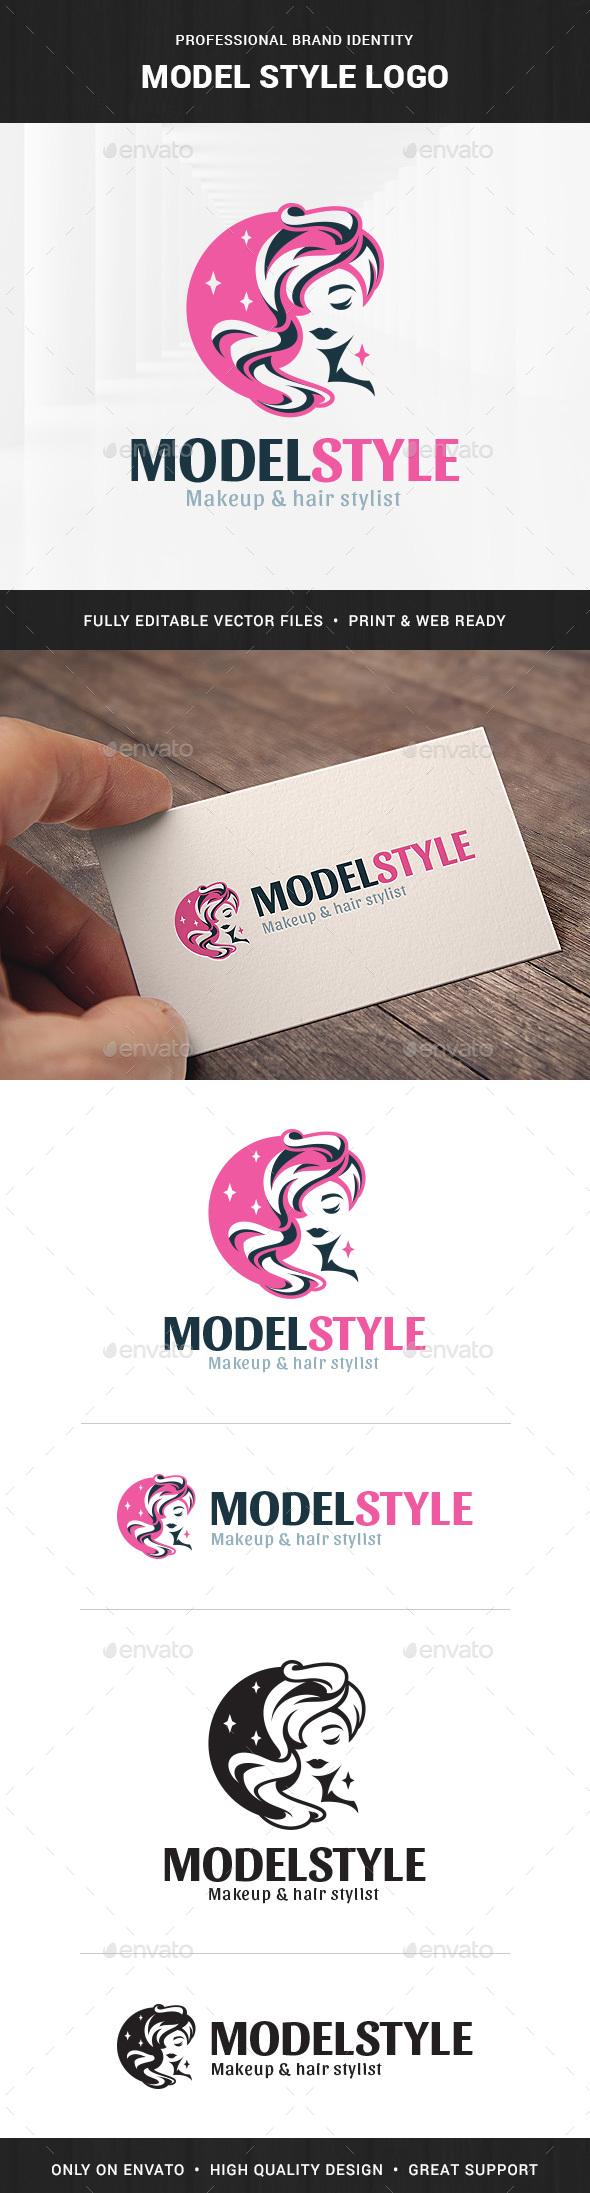 Model Style Logo Template